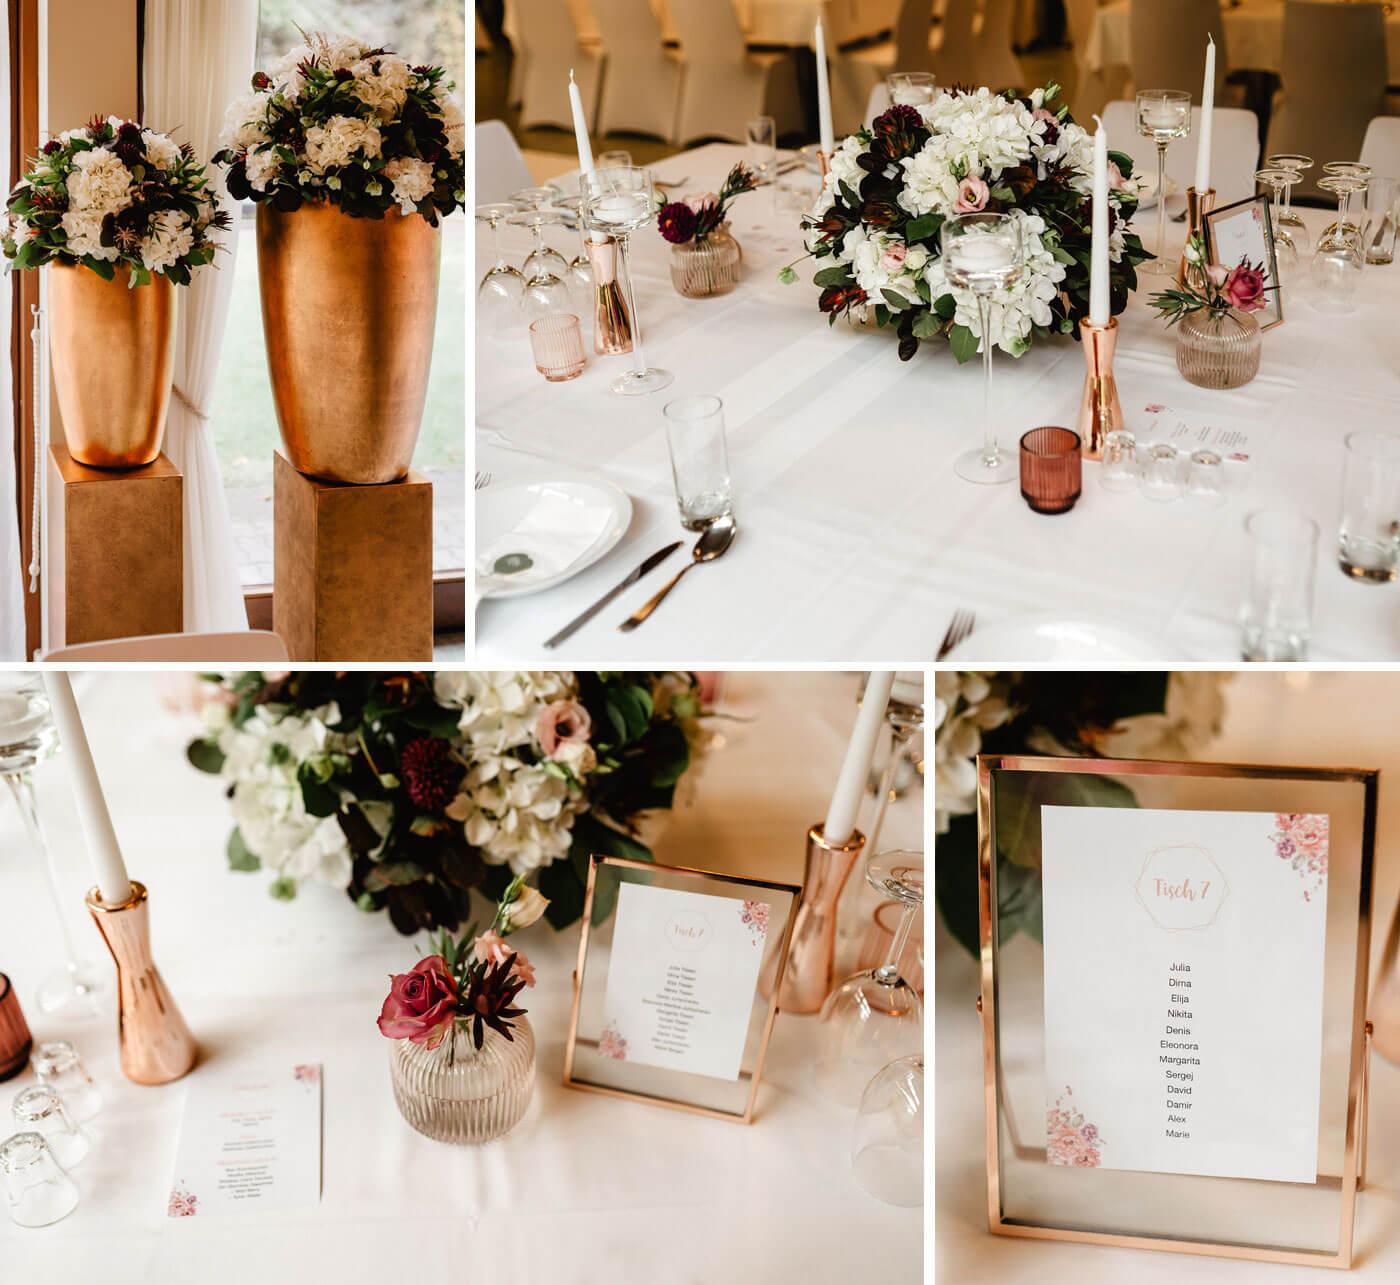 Hochzeitssaal Tischdeko